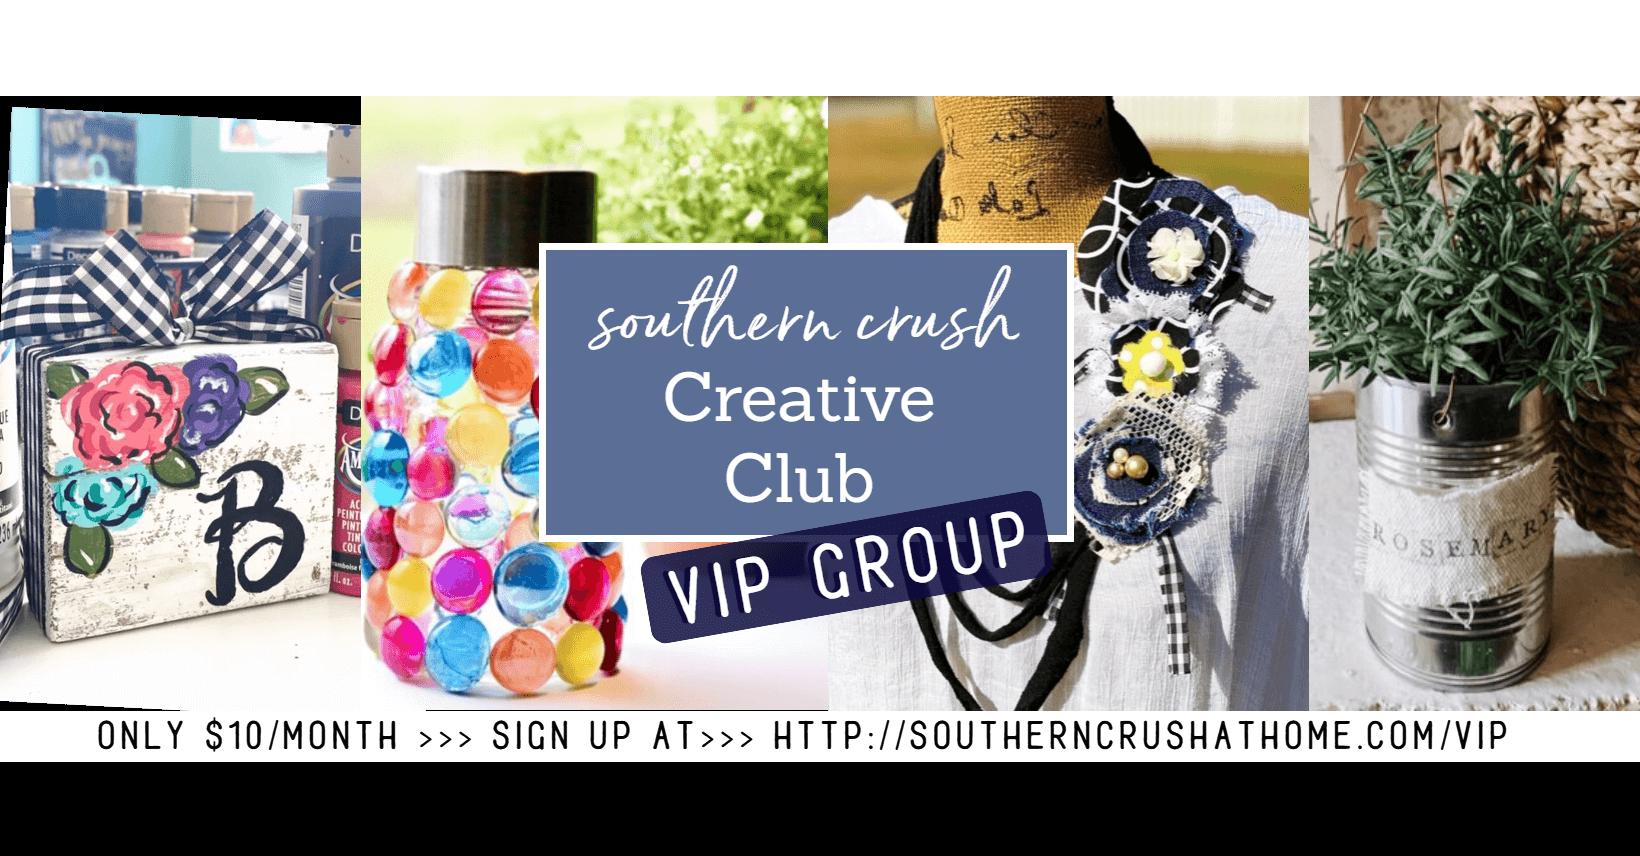 Southern Crush Creative Club VIP group cover